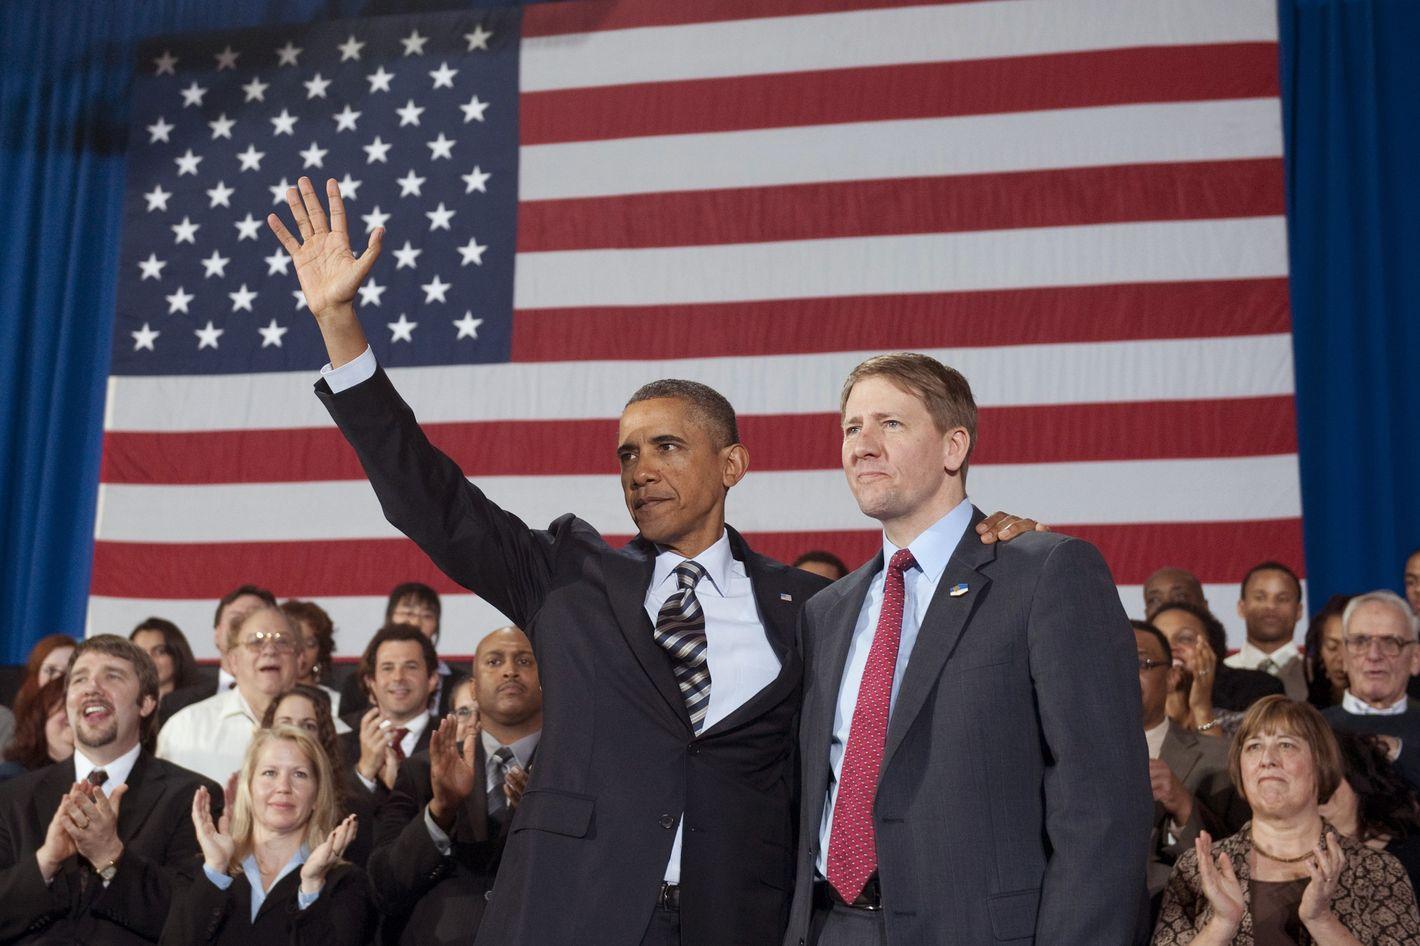 US President Barack Obama waves alongside Richard Cordray (R) on January 4, 2012.